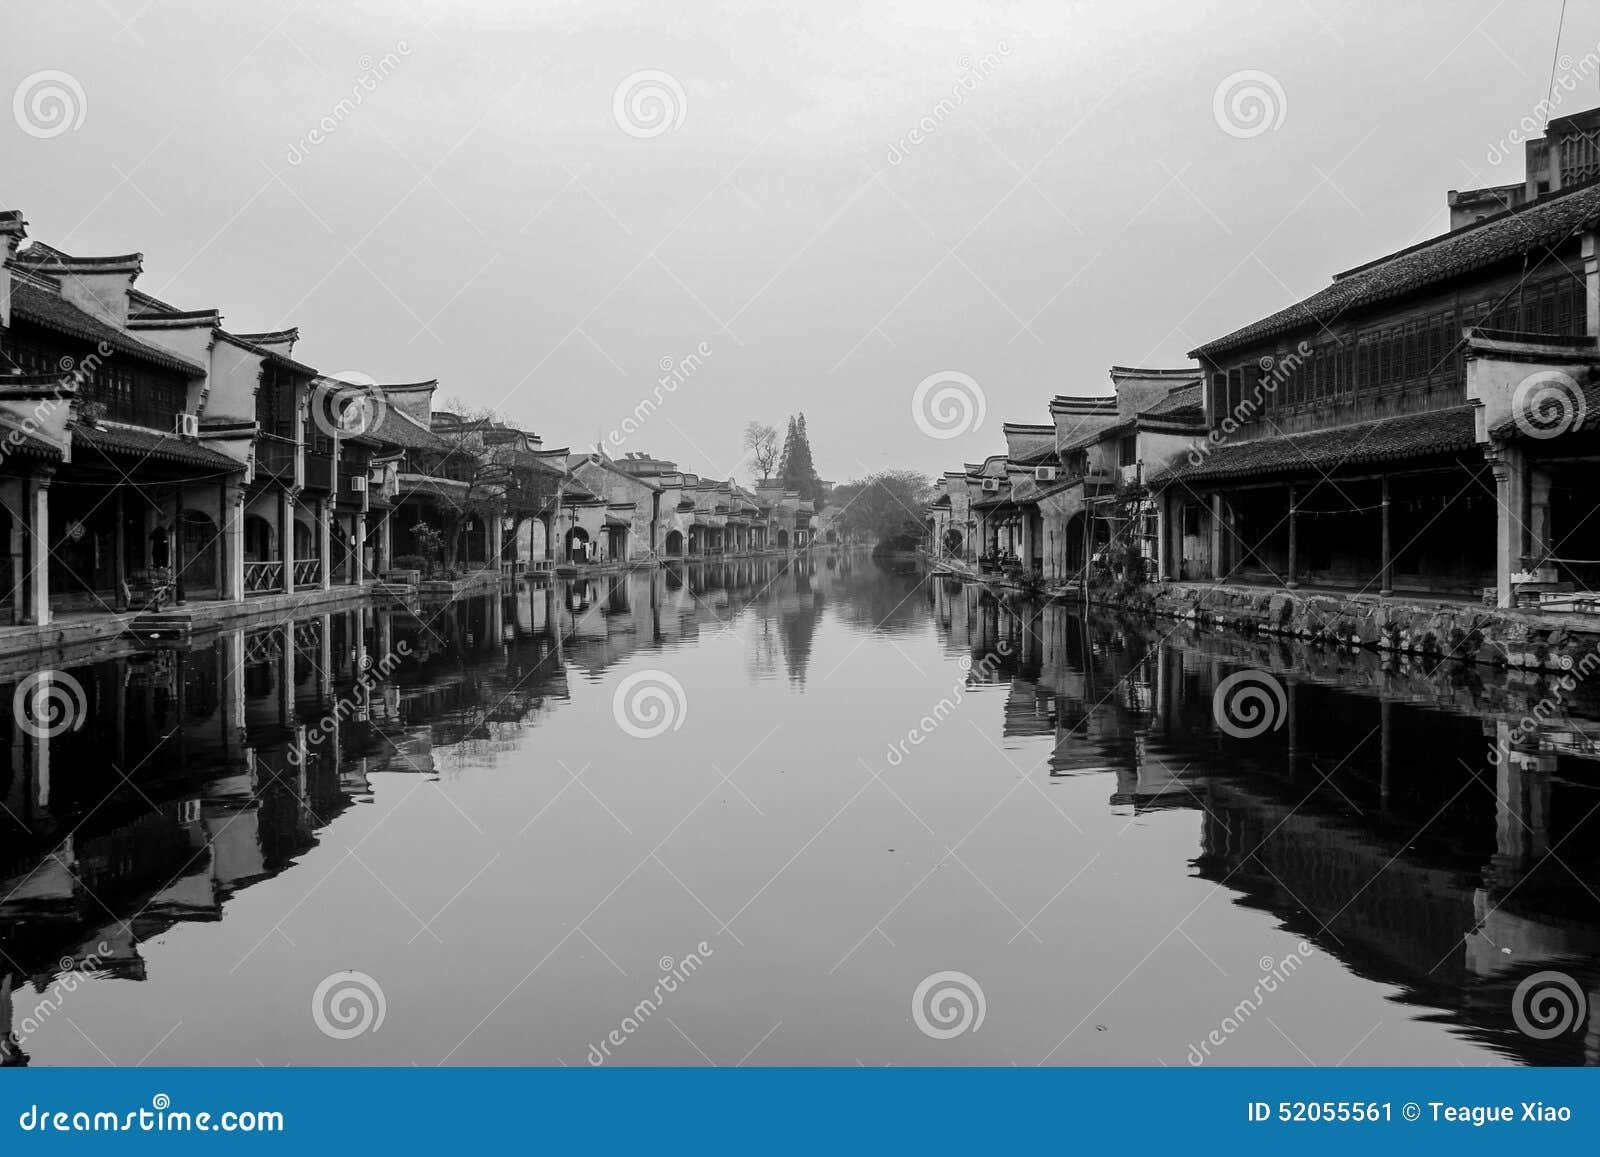 Huzhou Nanxun Old Town